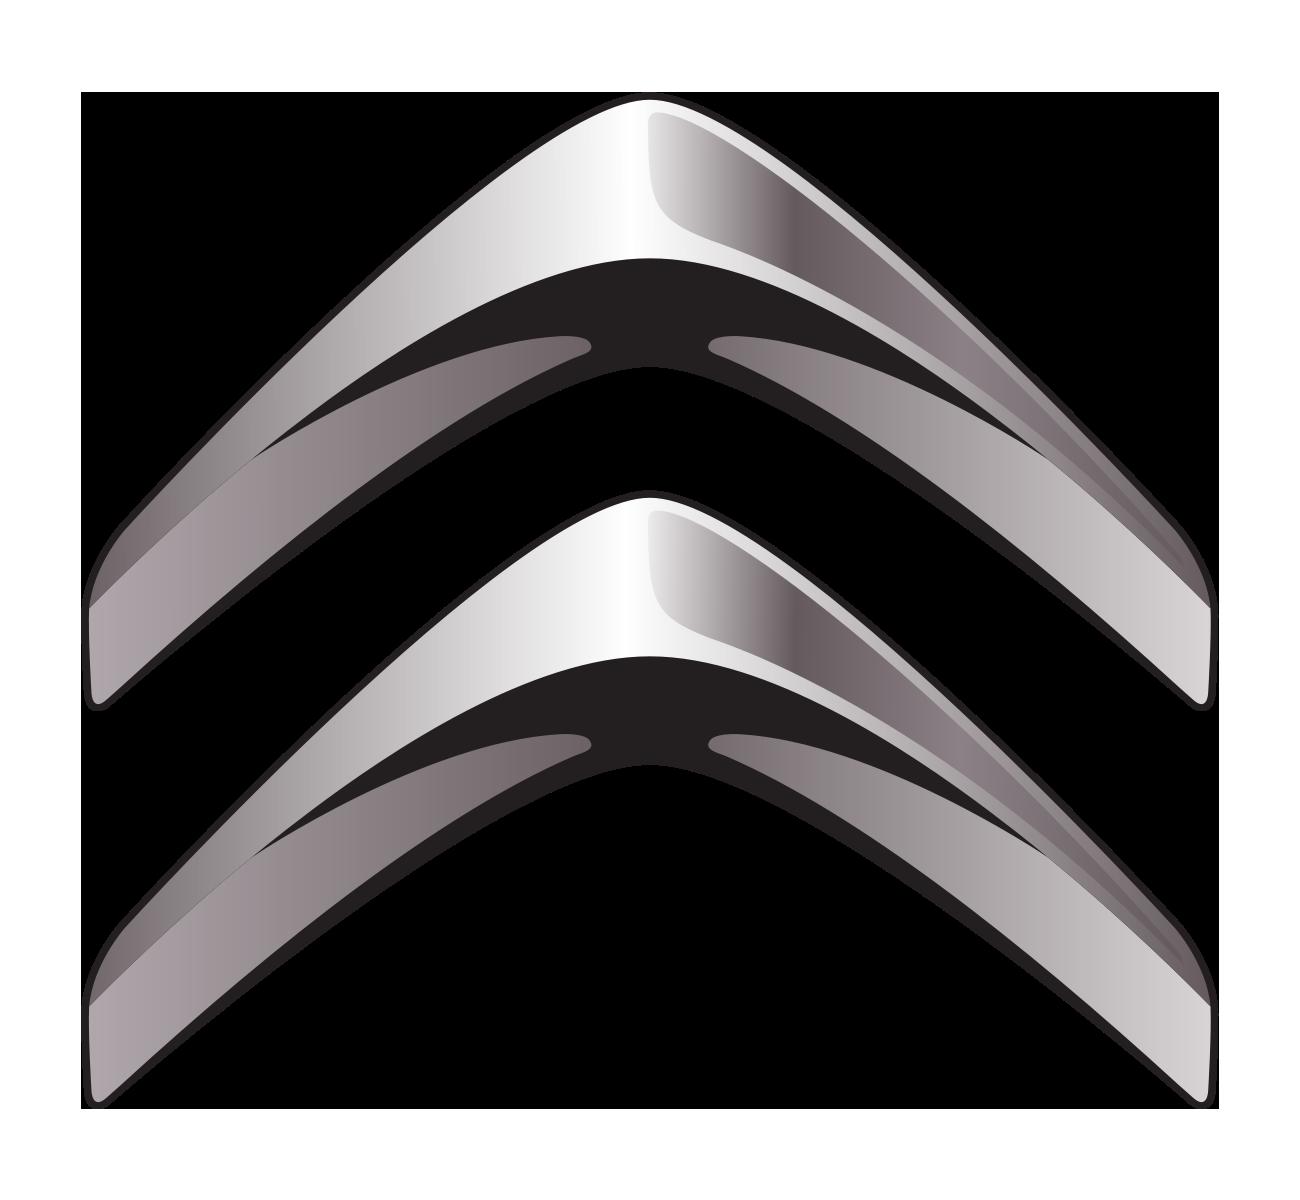 Citroen PNG images Download